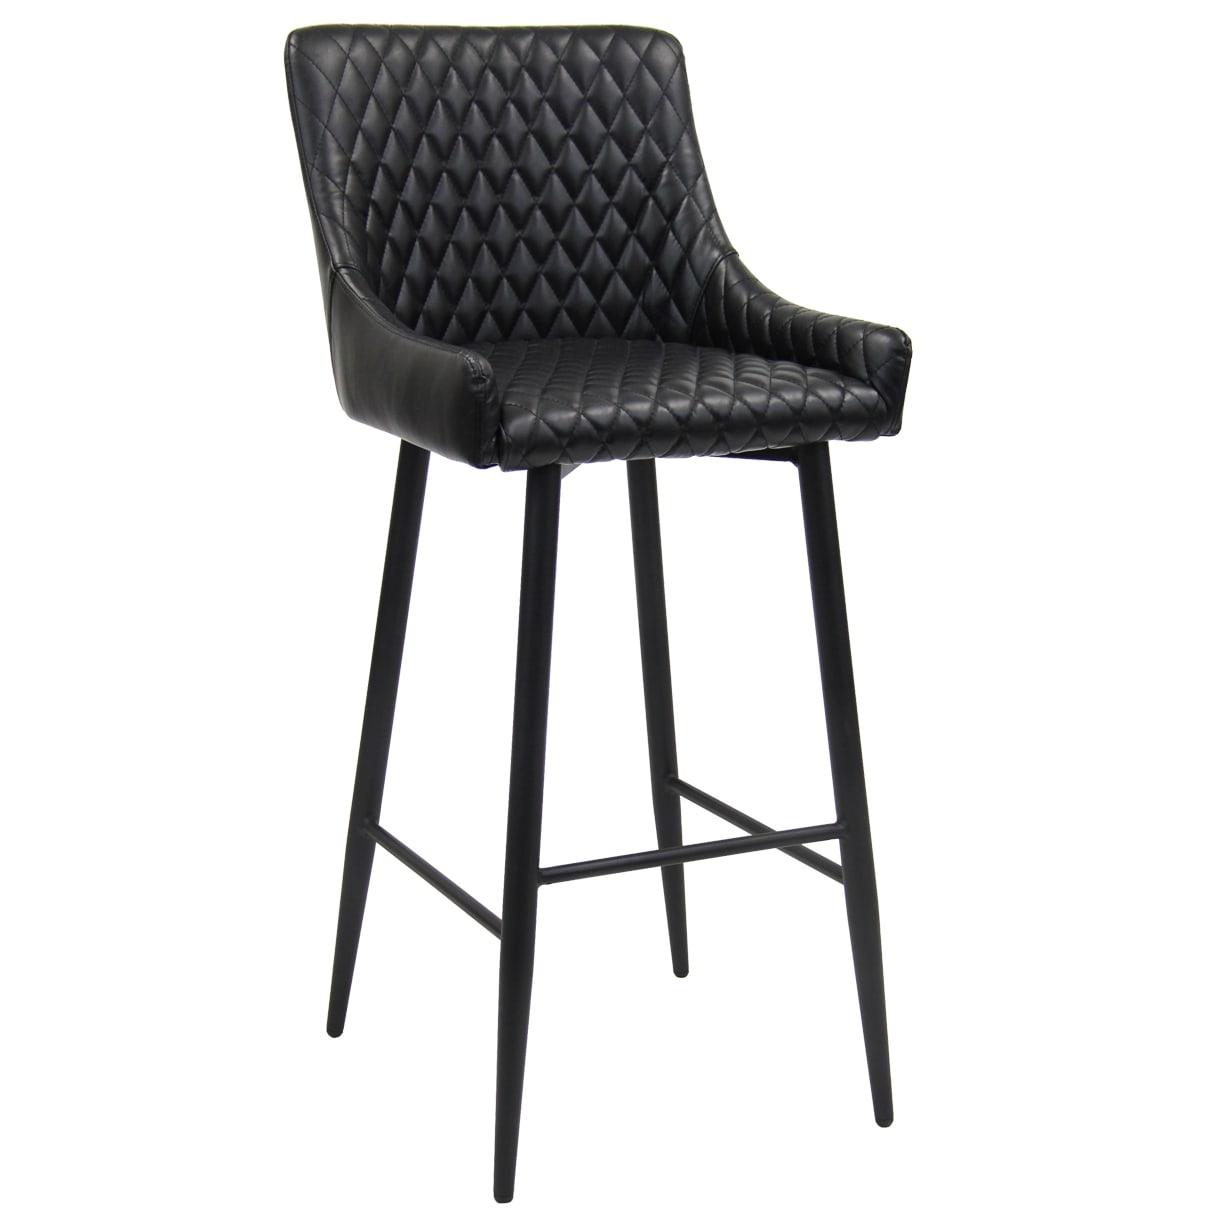 Maal Diamond Stitch Upholstered Bar stool